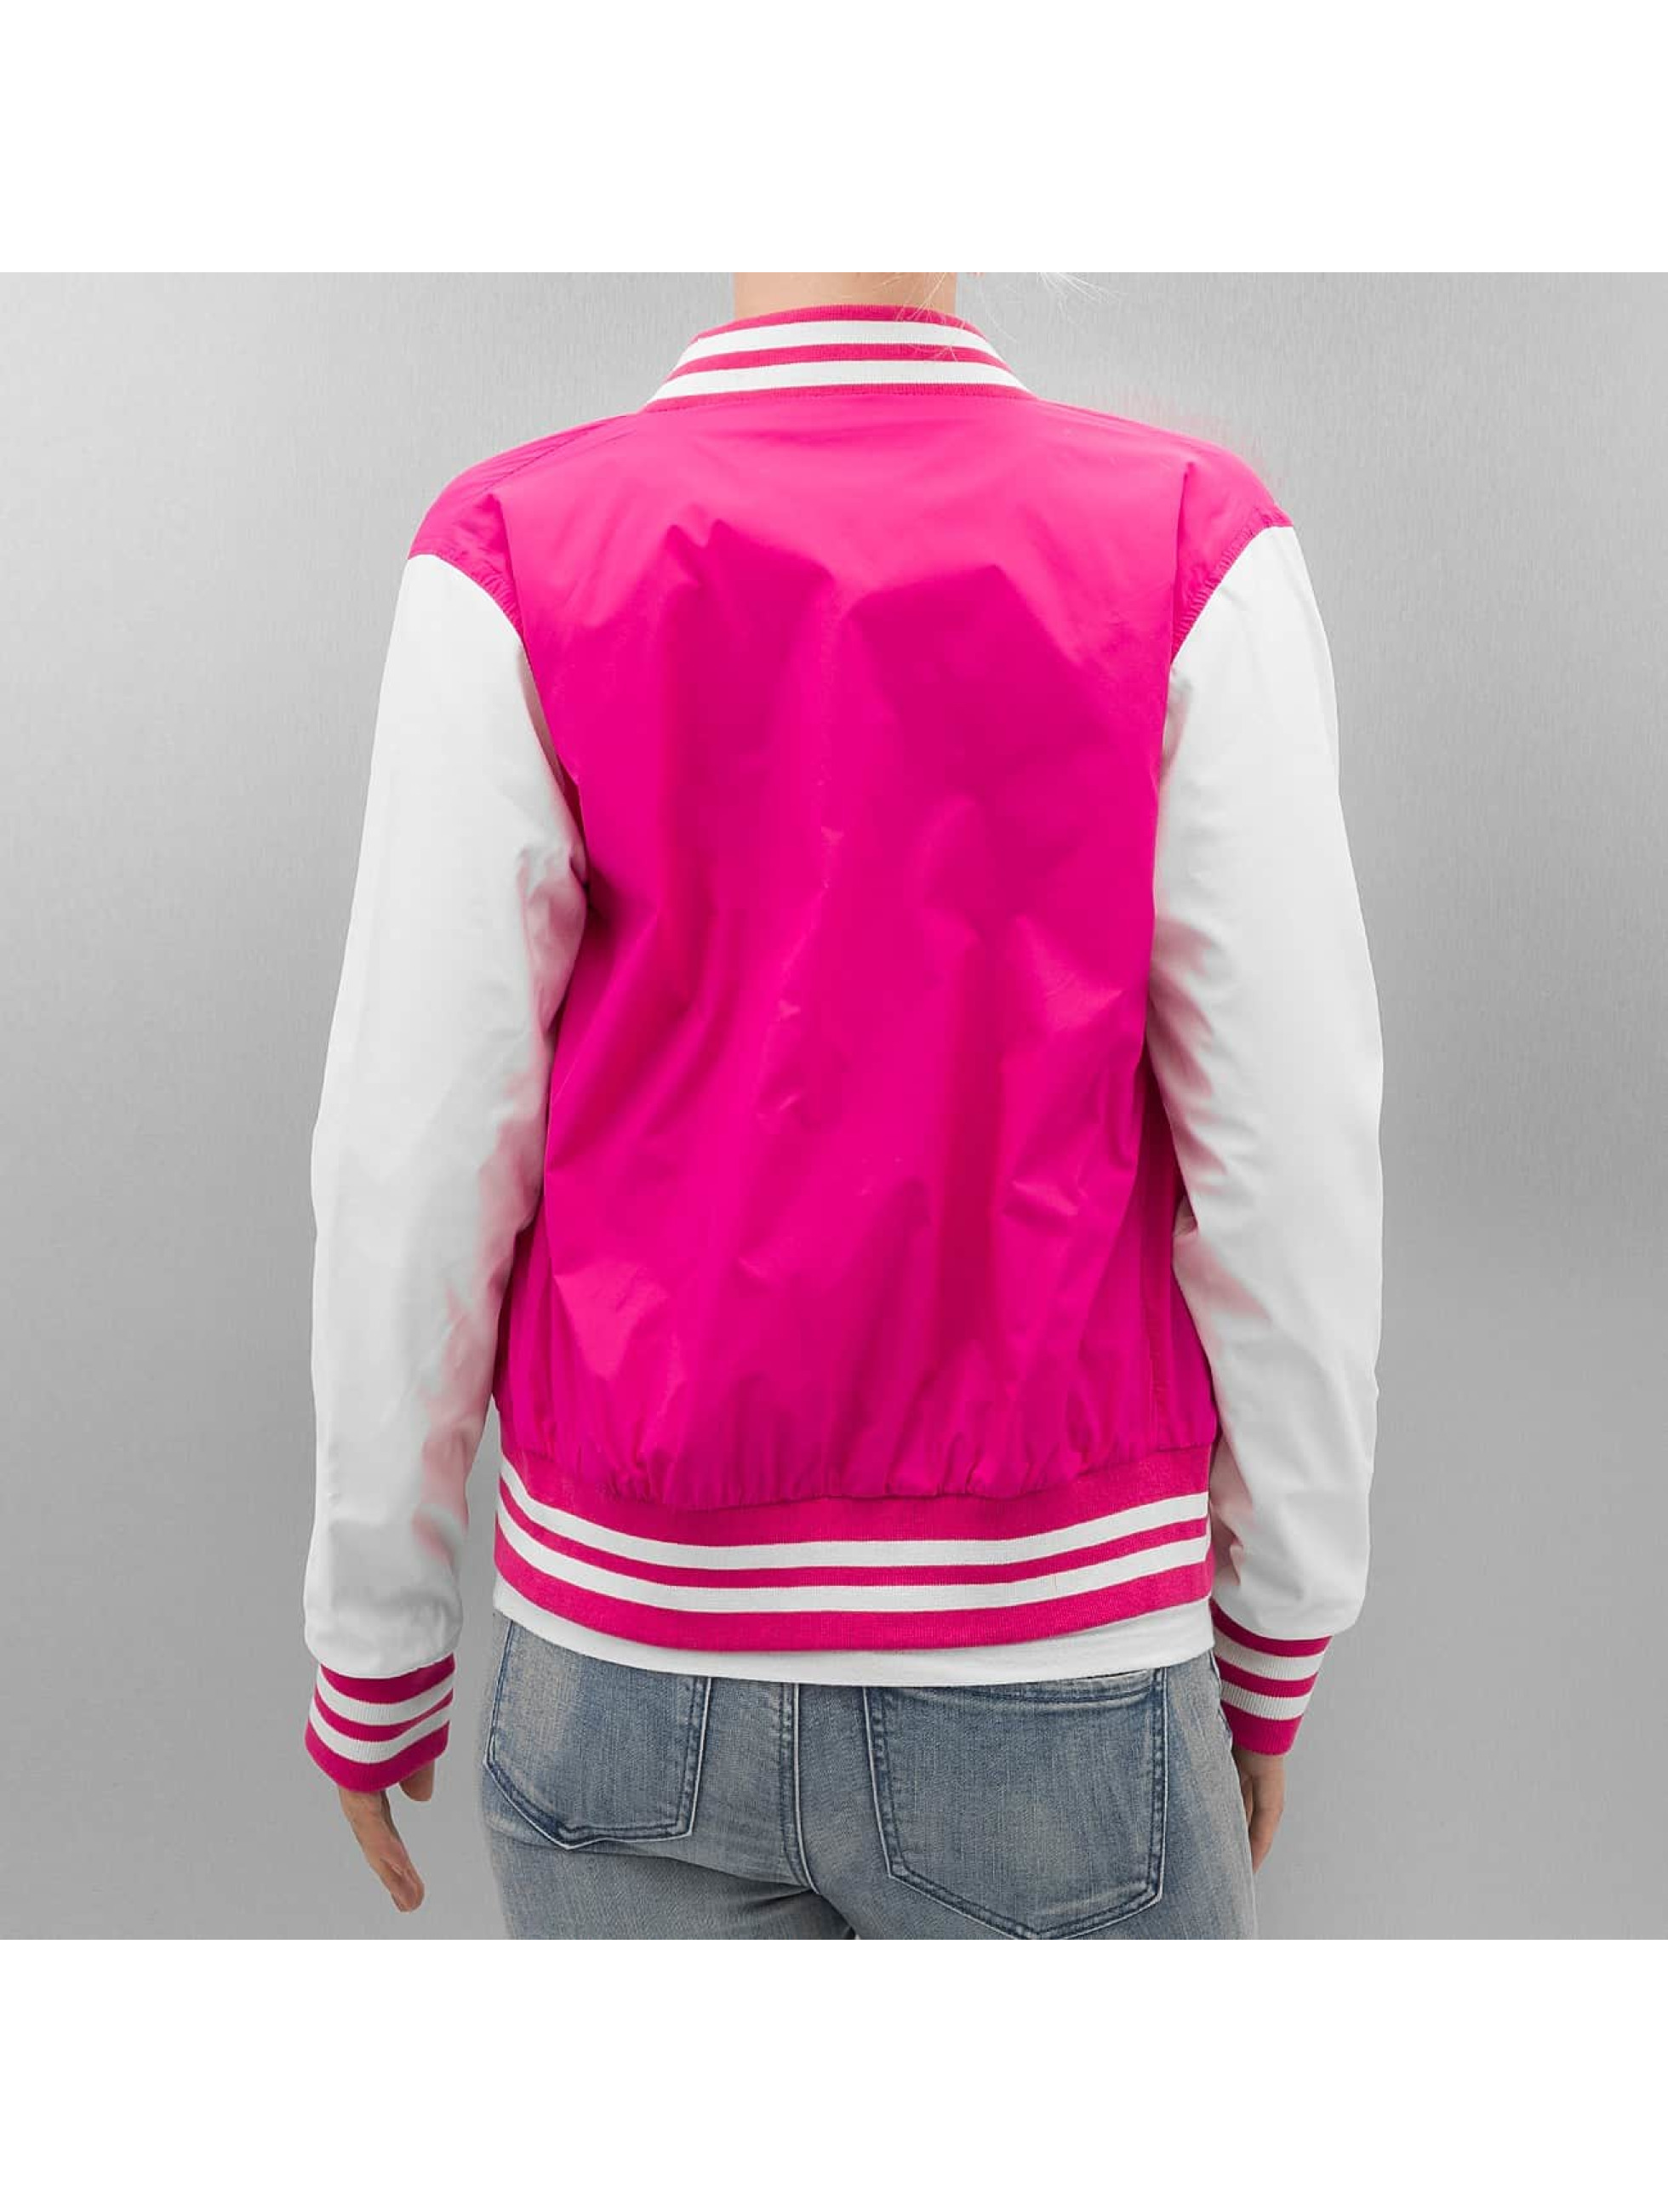 Urban Classics College Jacke Light pink